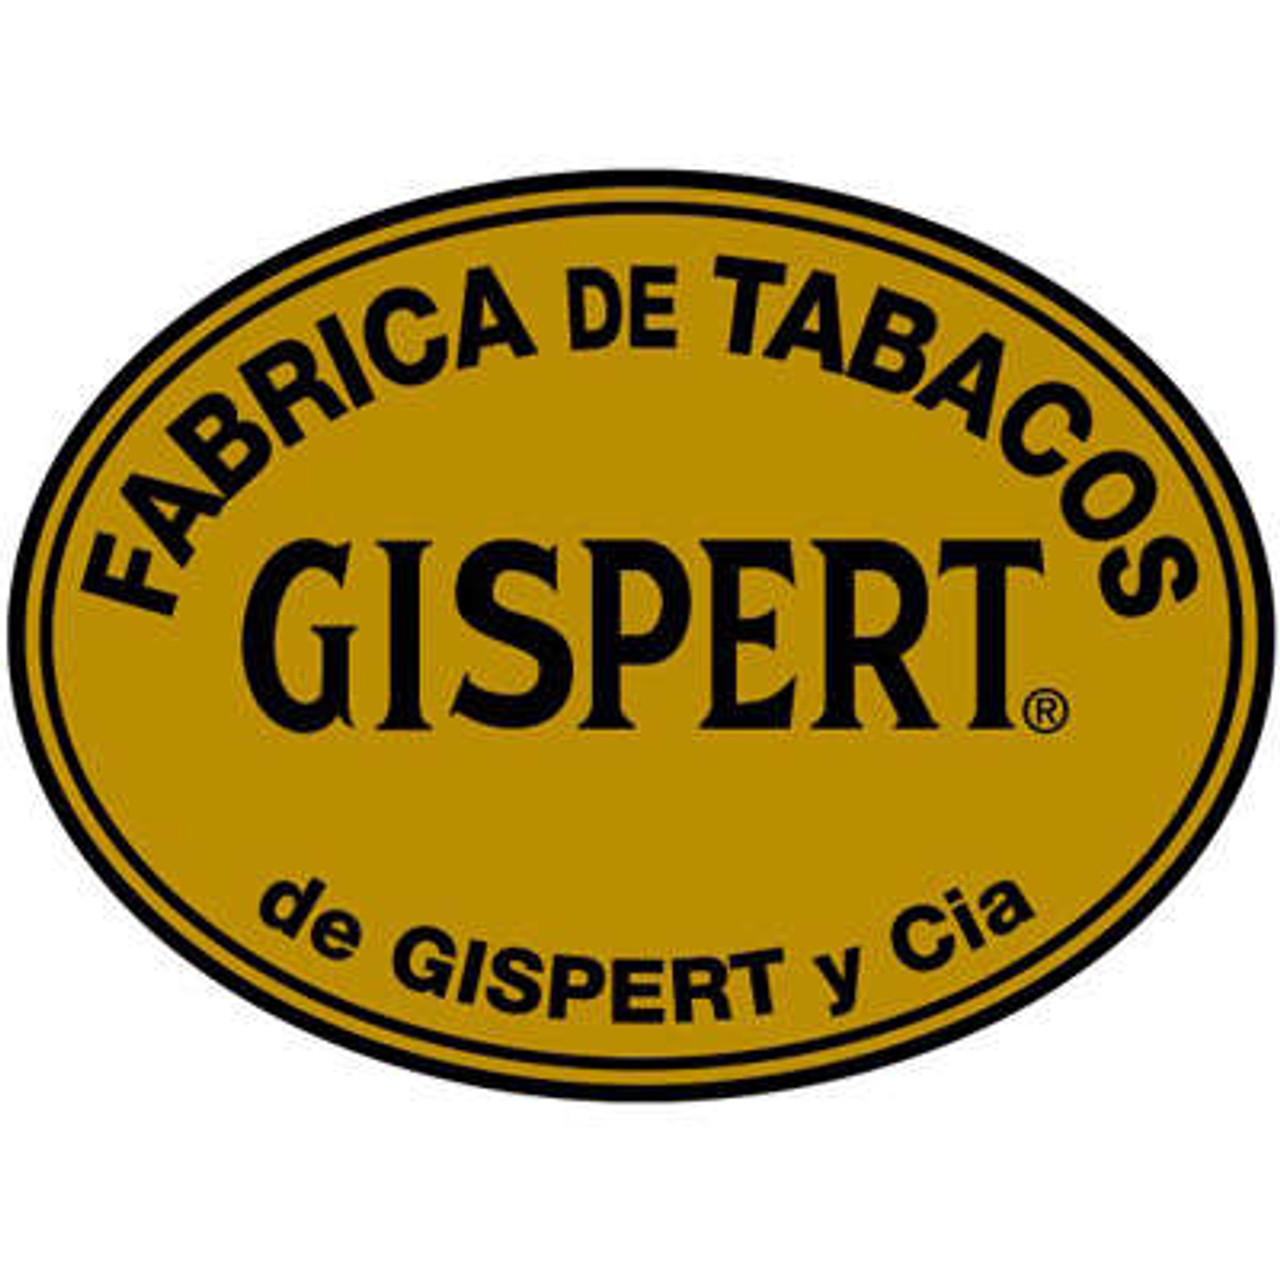 Gispert Corona Natural Cigars - 5.5 x 44 (Box of 25)